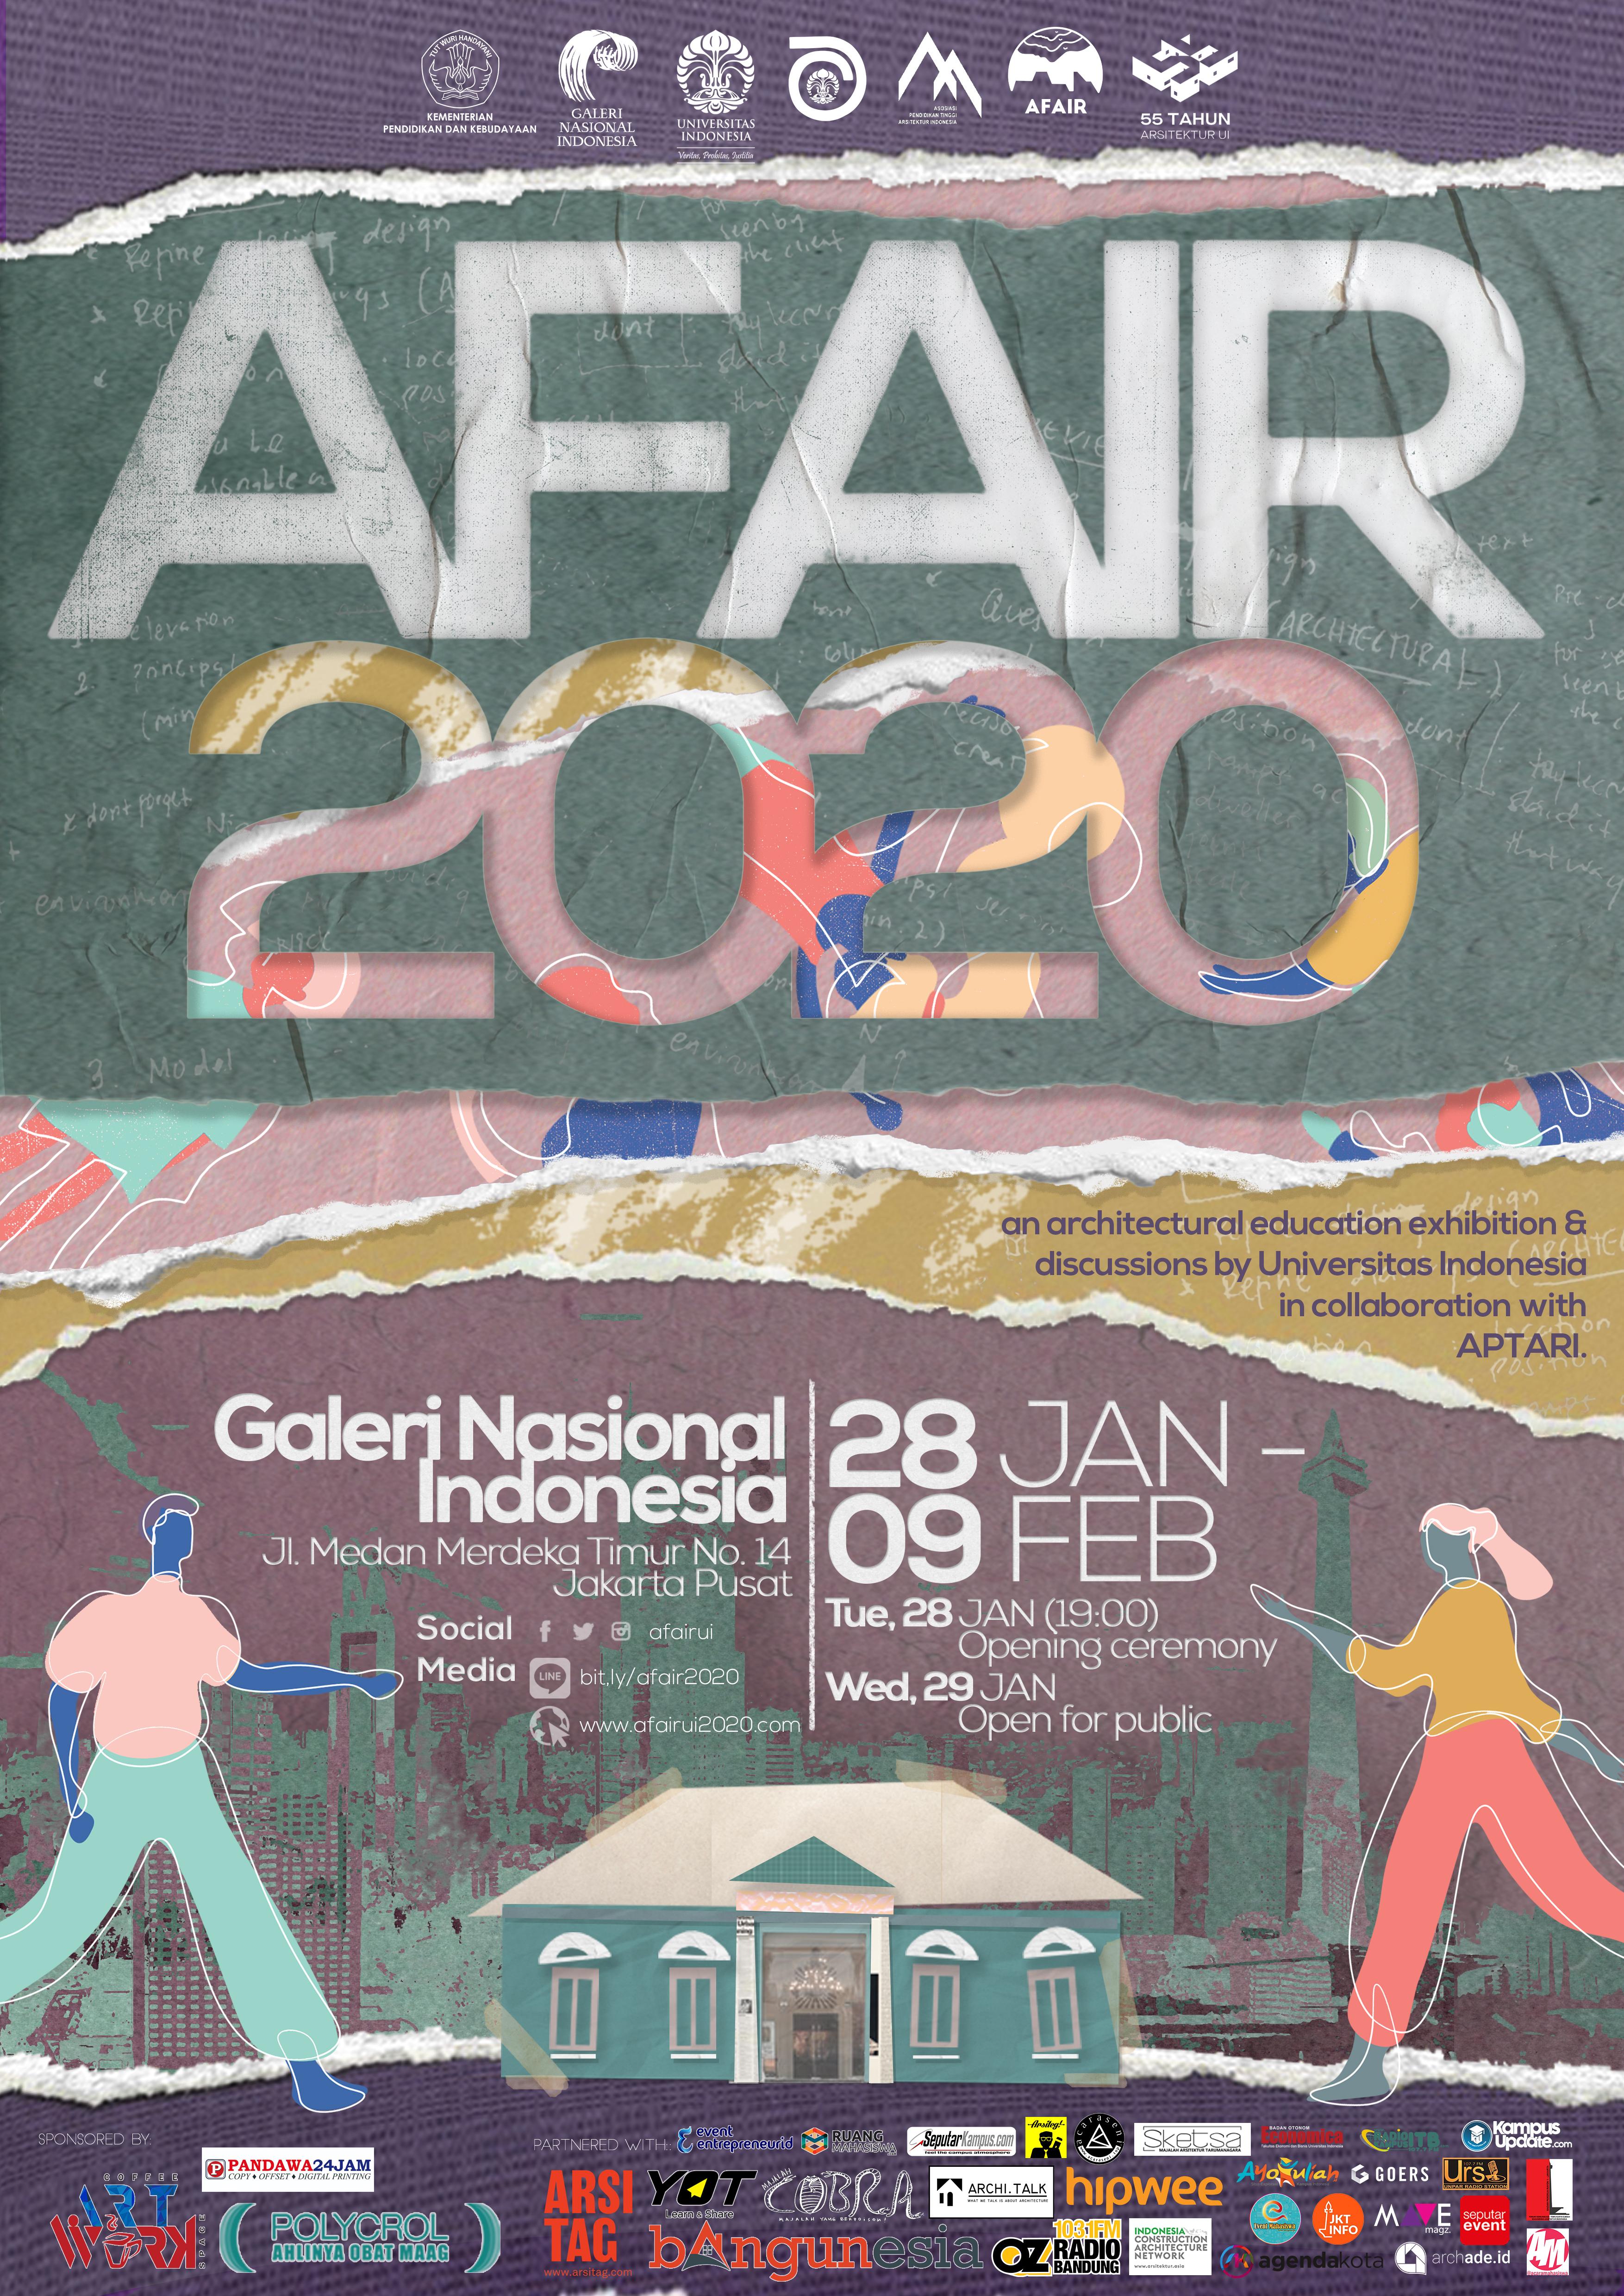 Afair 2020